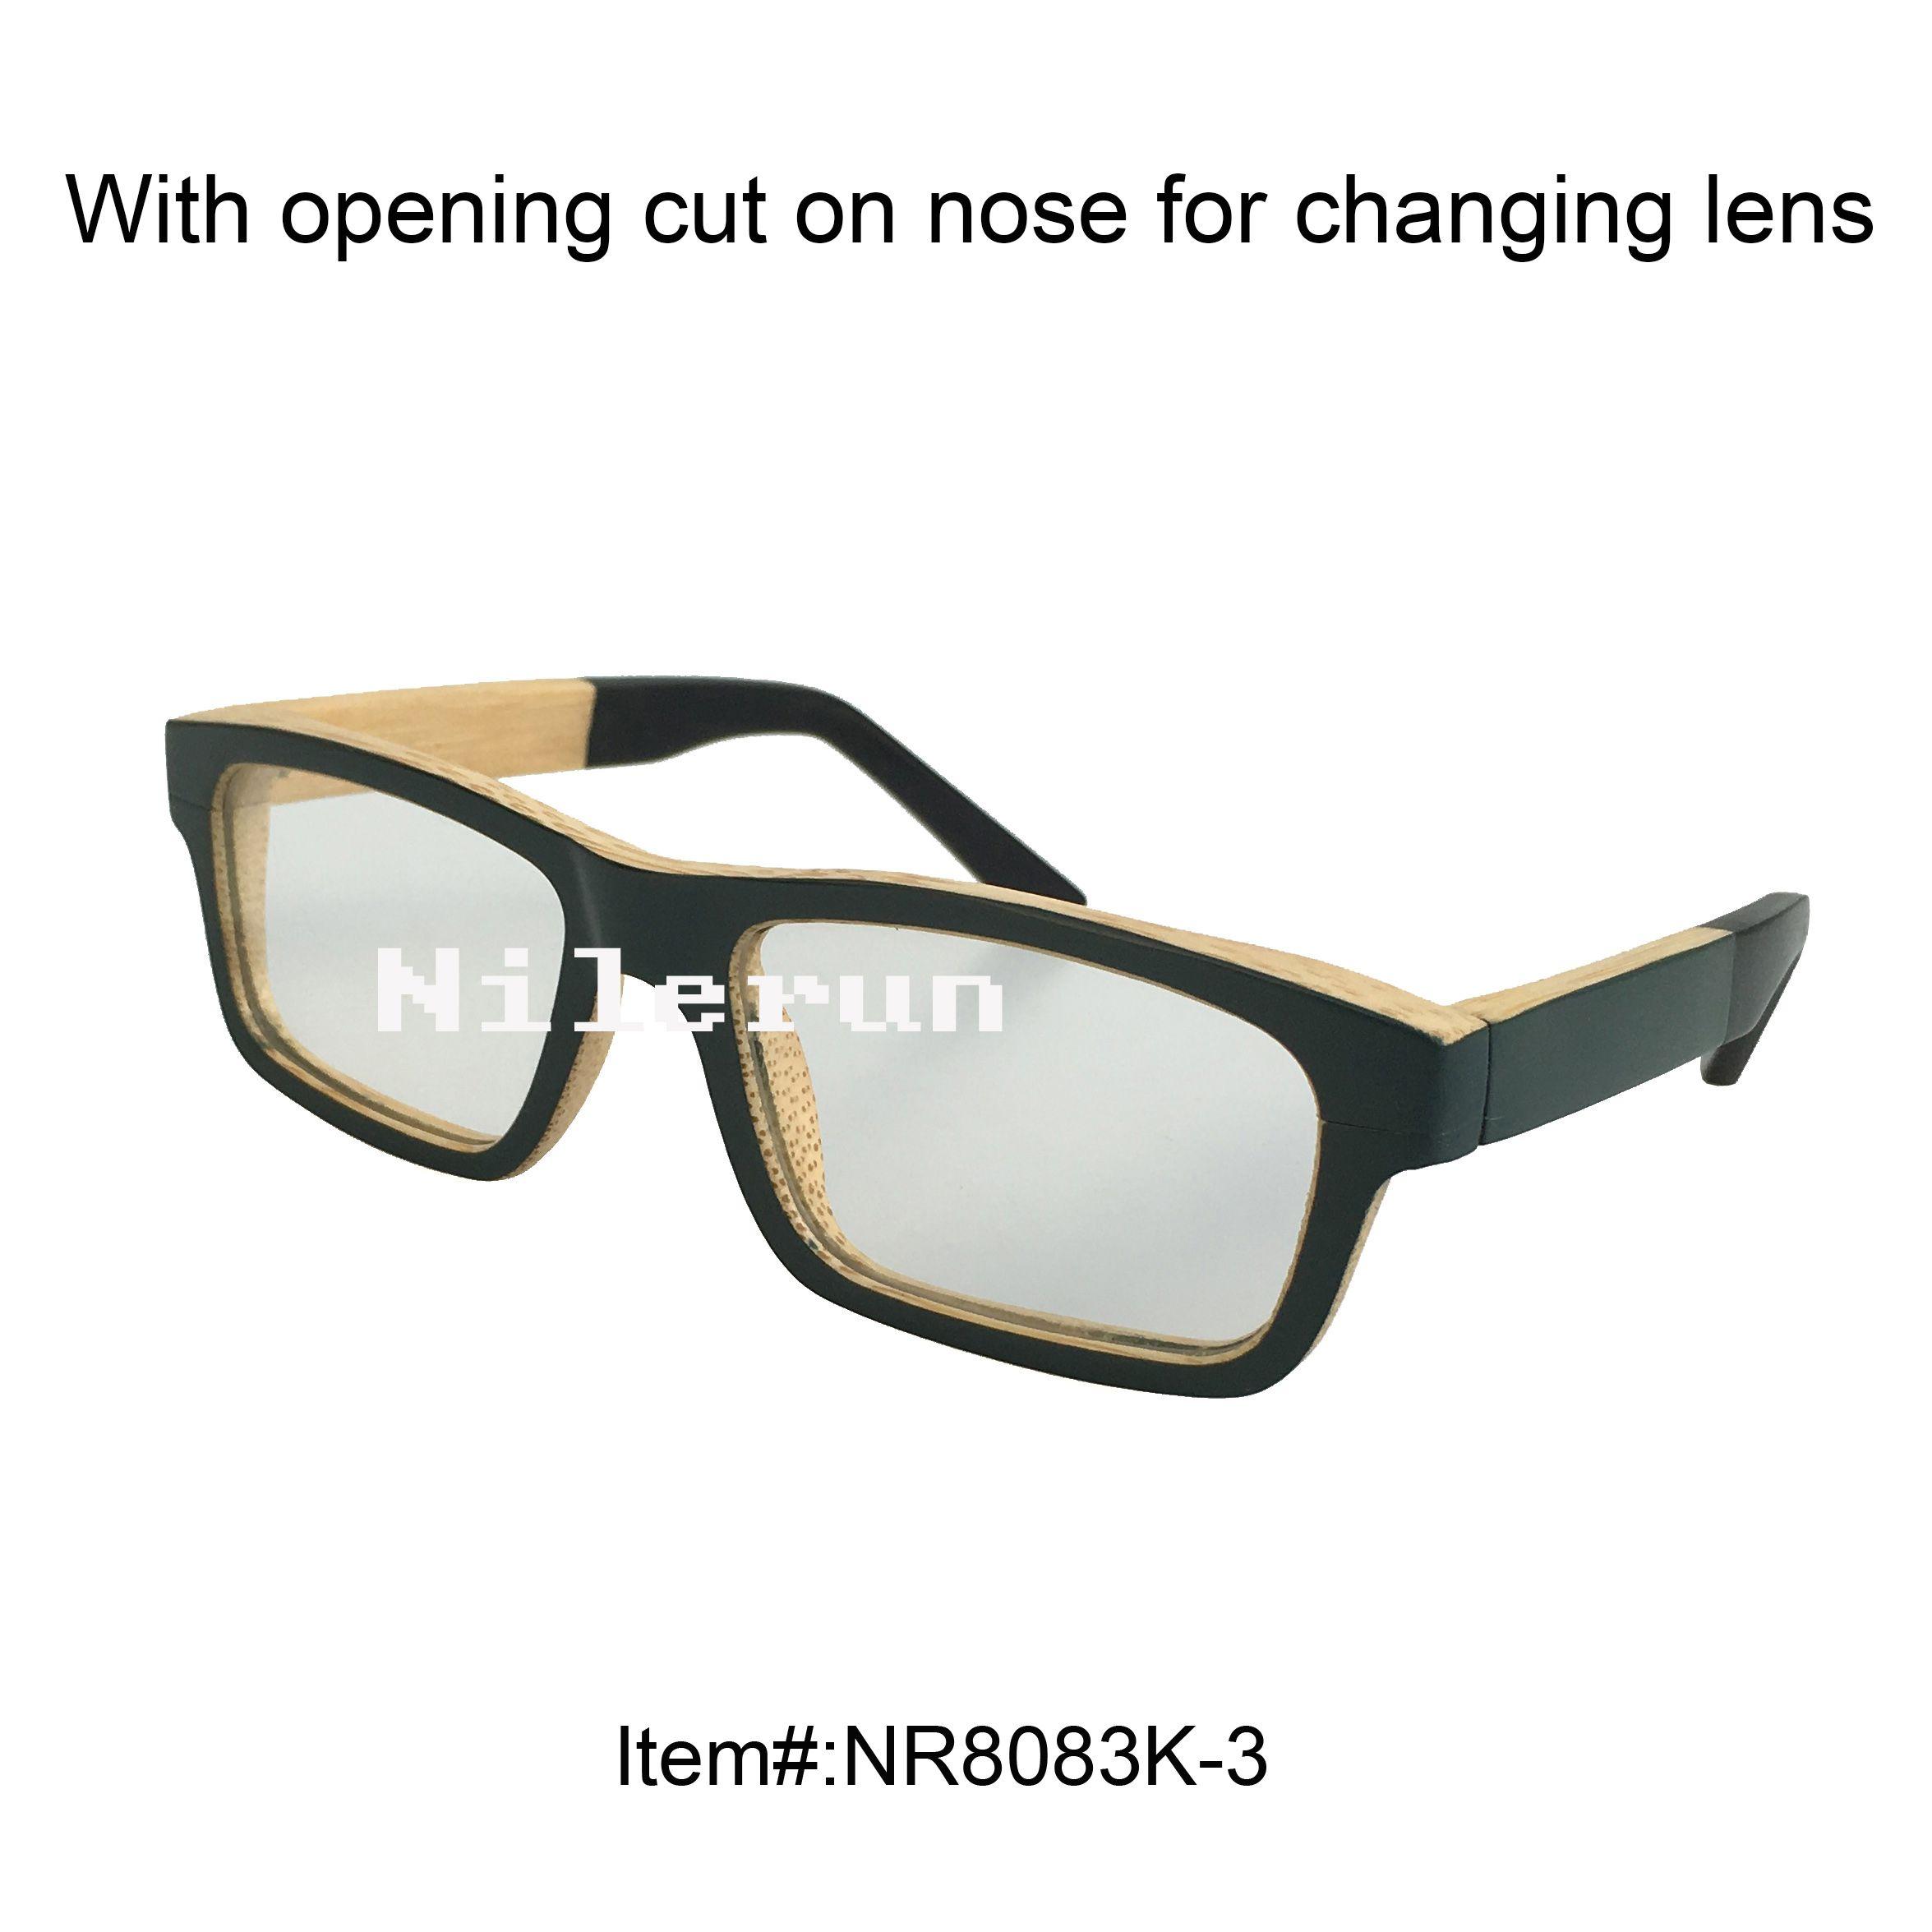 10e93f1abf Fashion Women s Rectangle Small Green Bamboo Optical Eyeglasses with ...